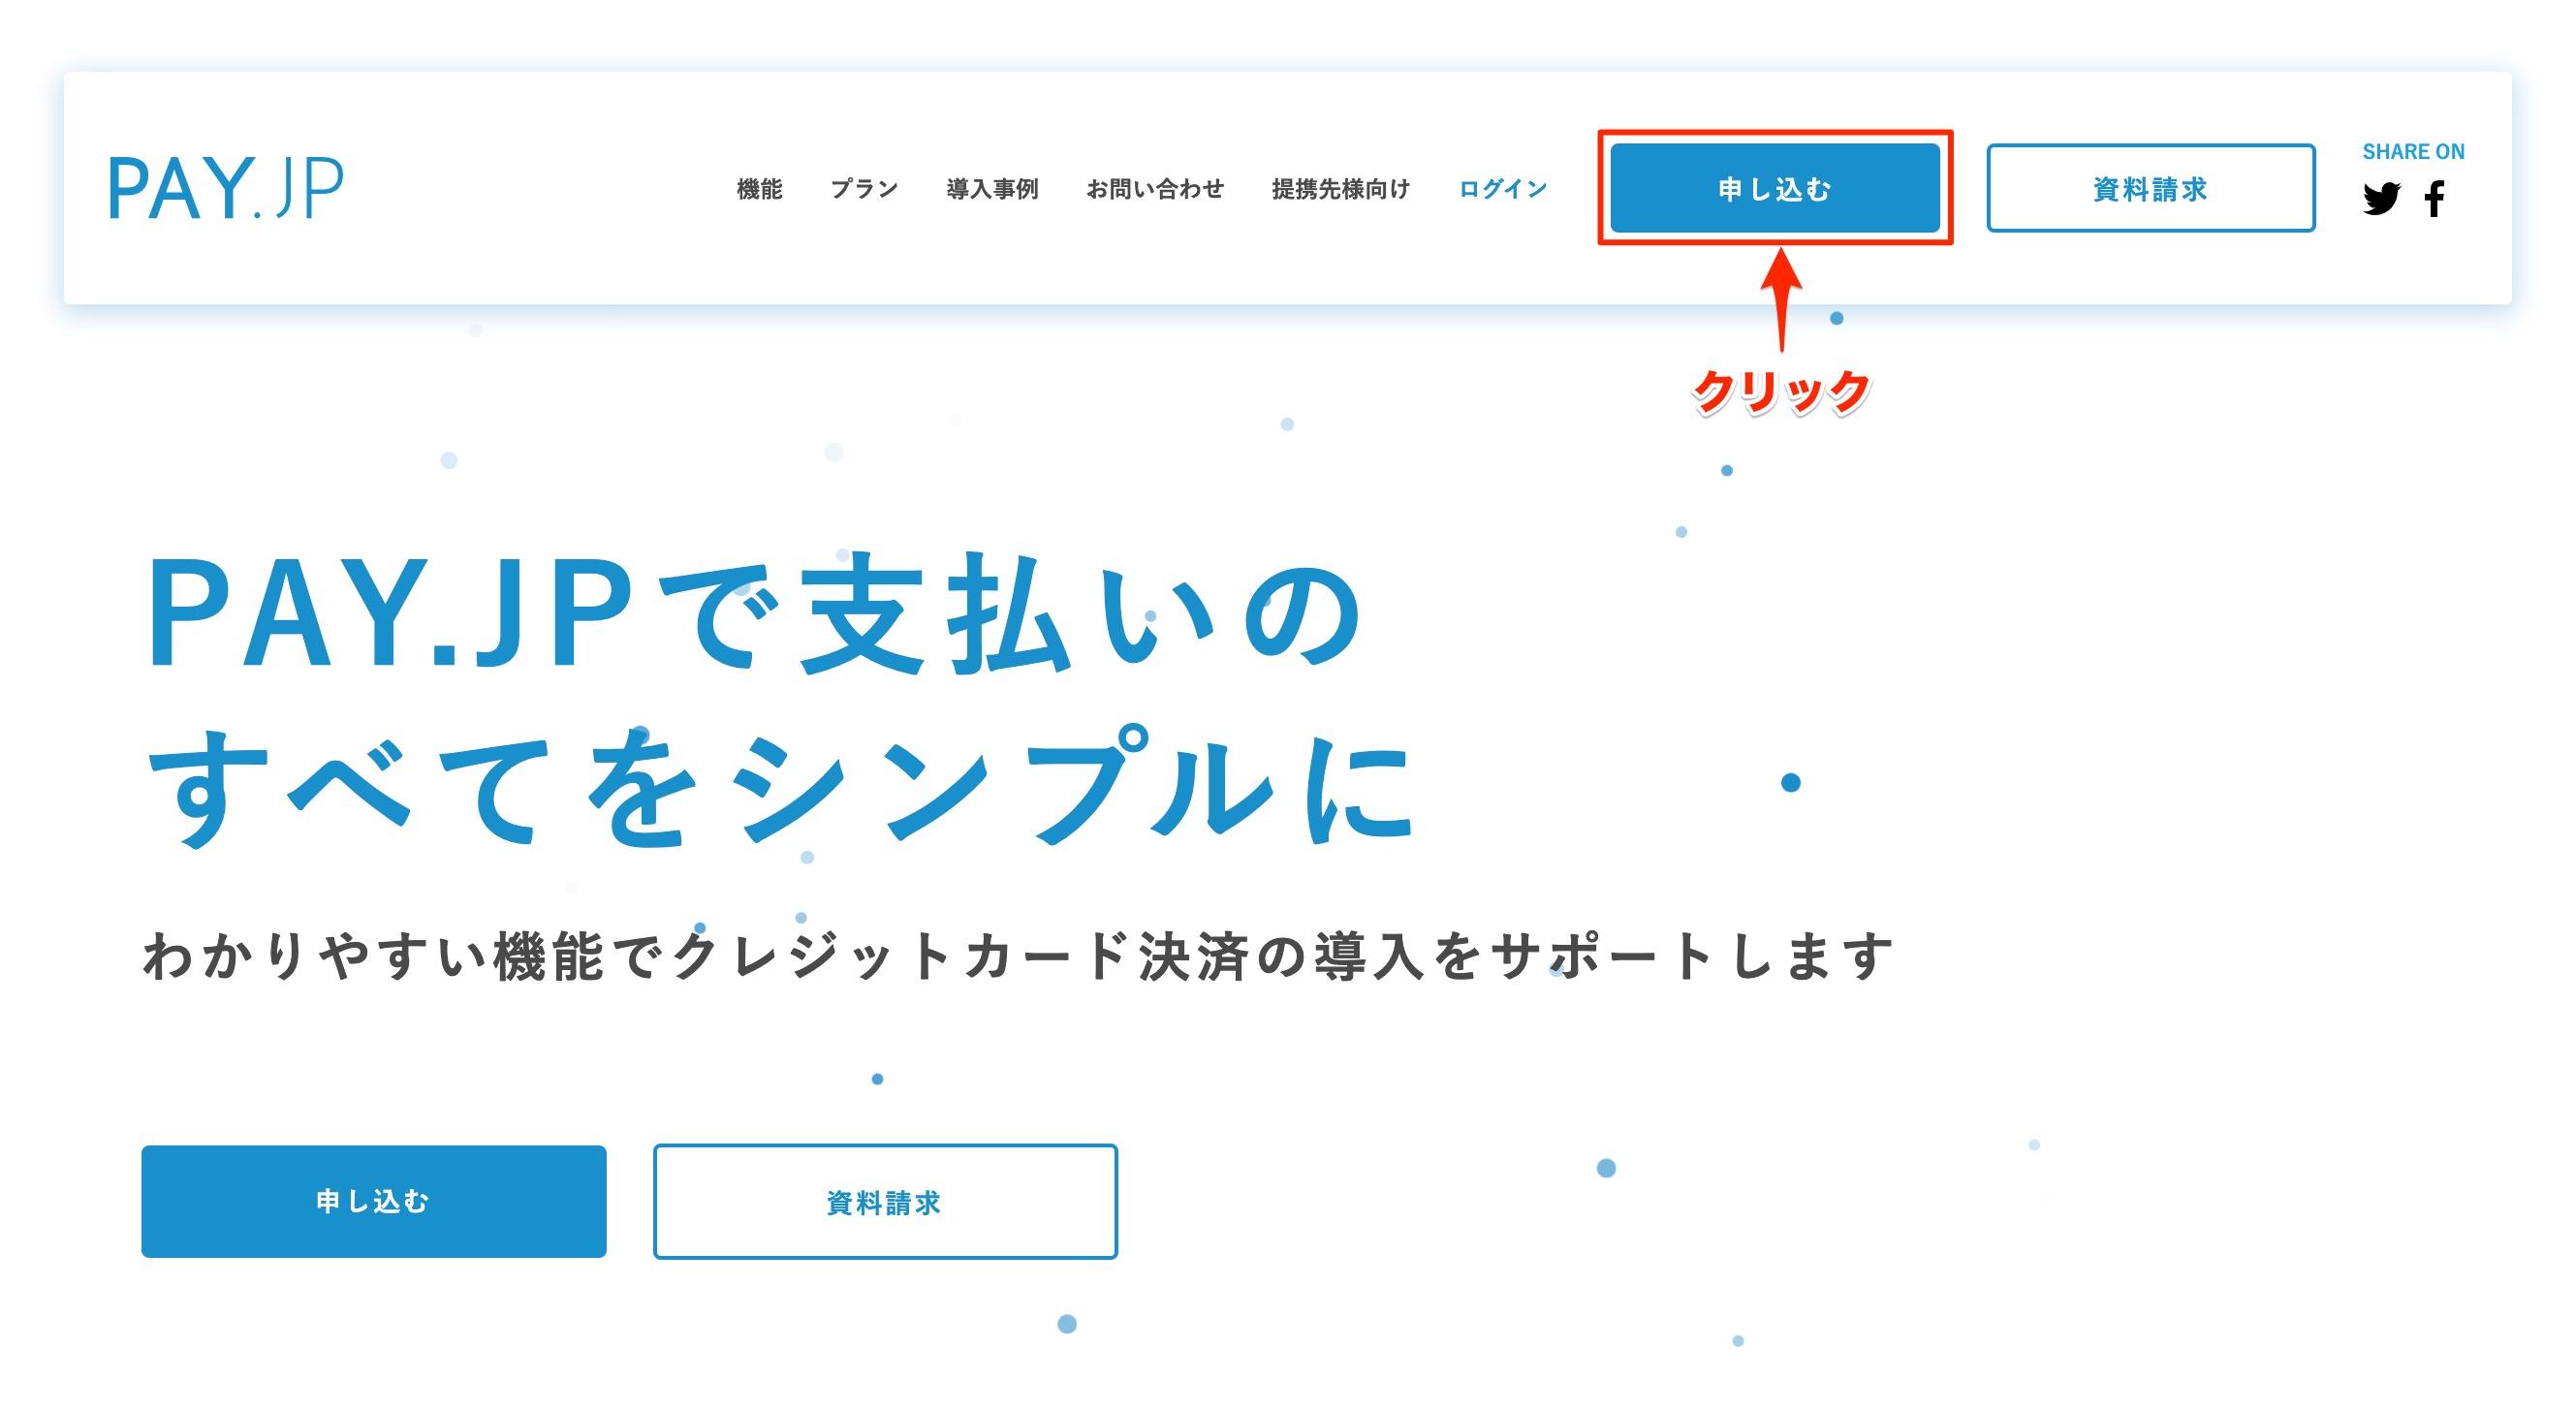 payjp公式サイト